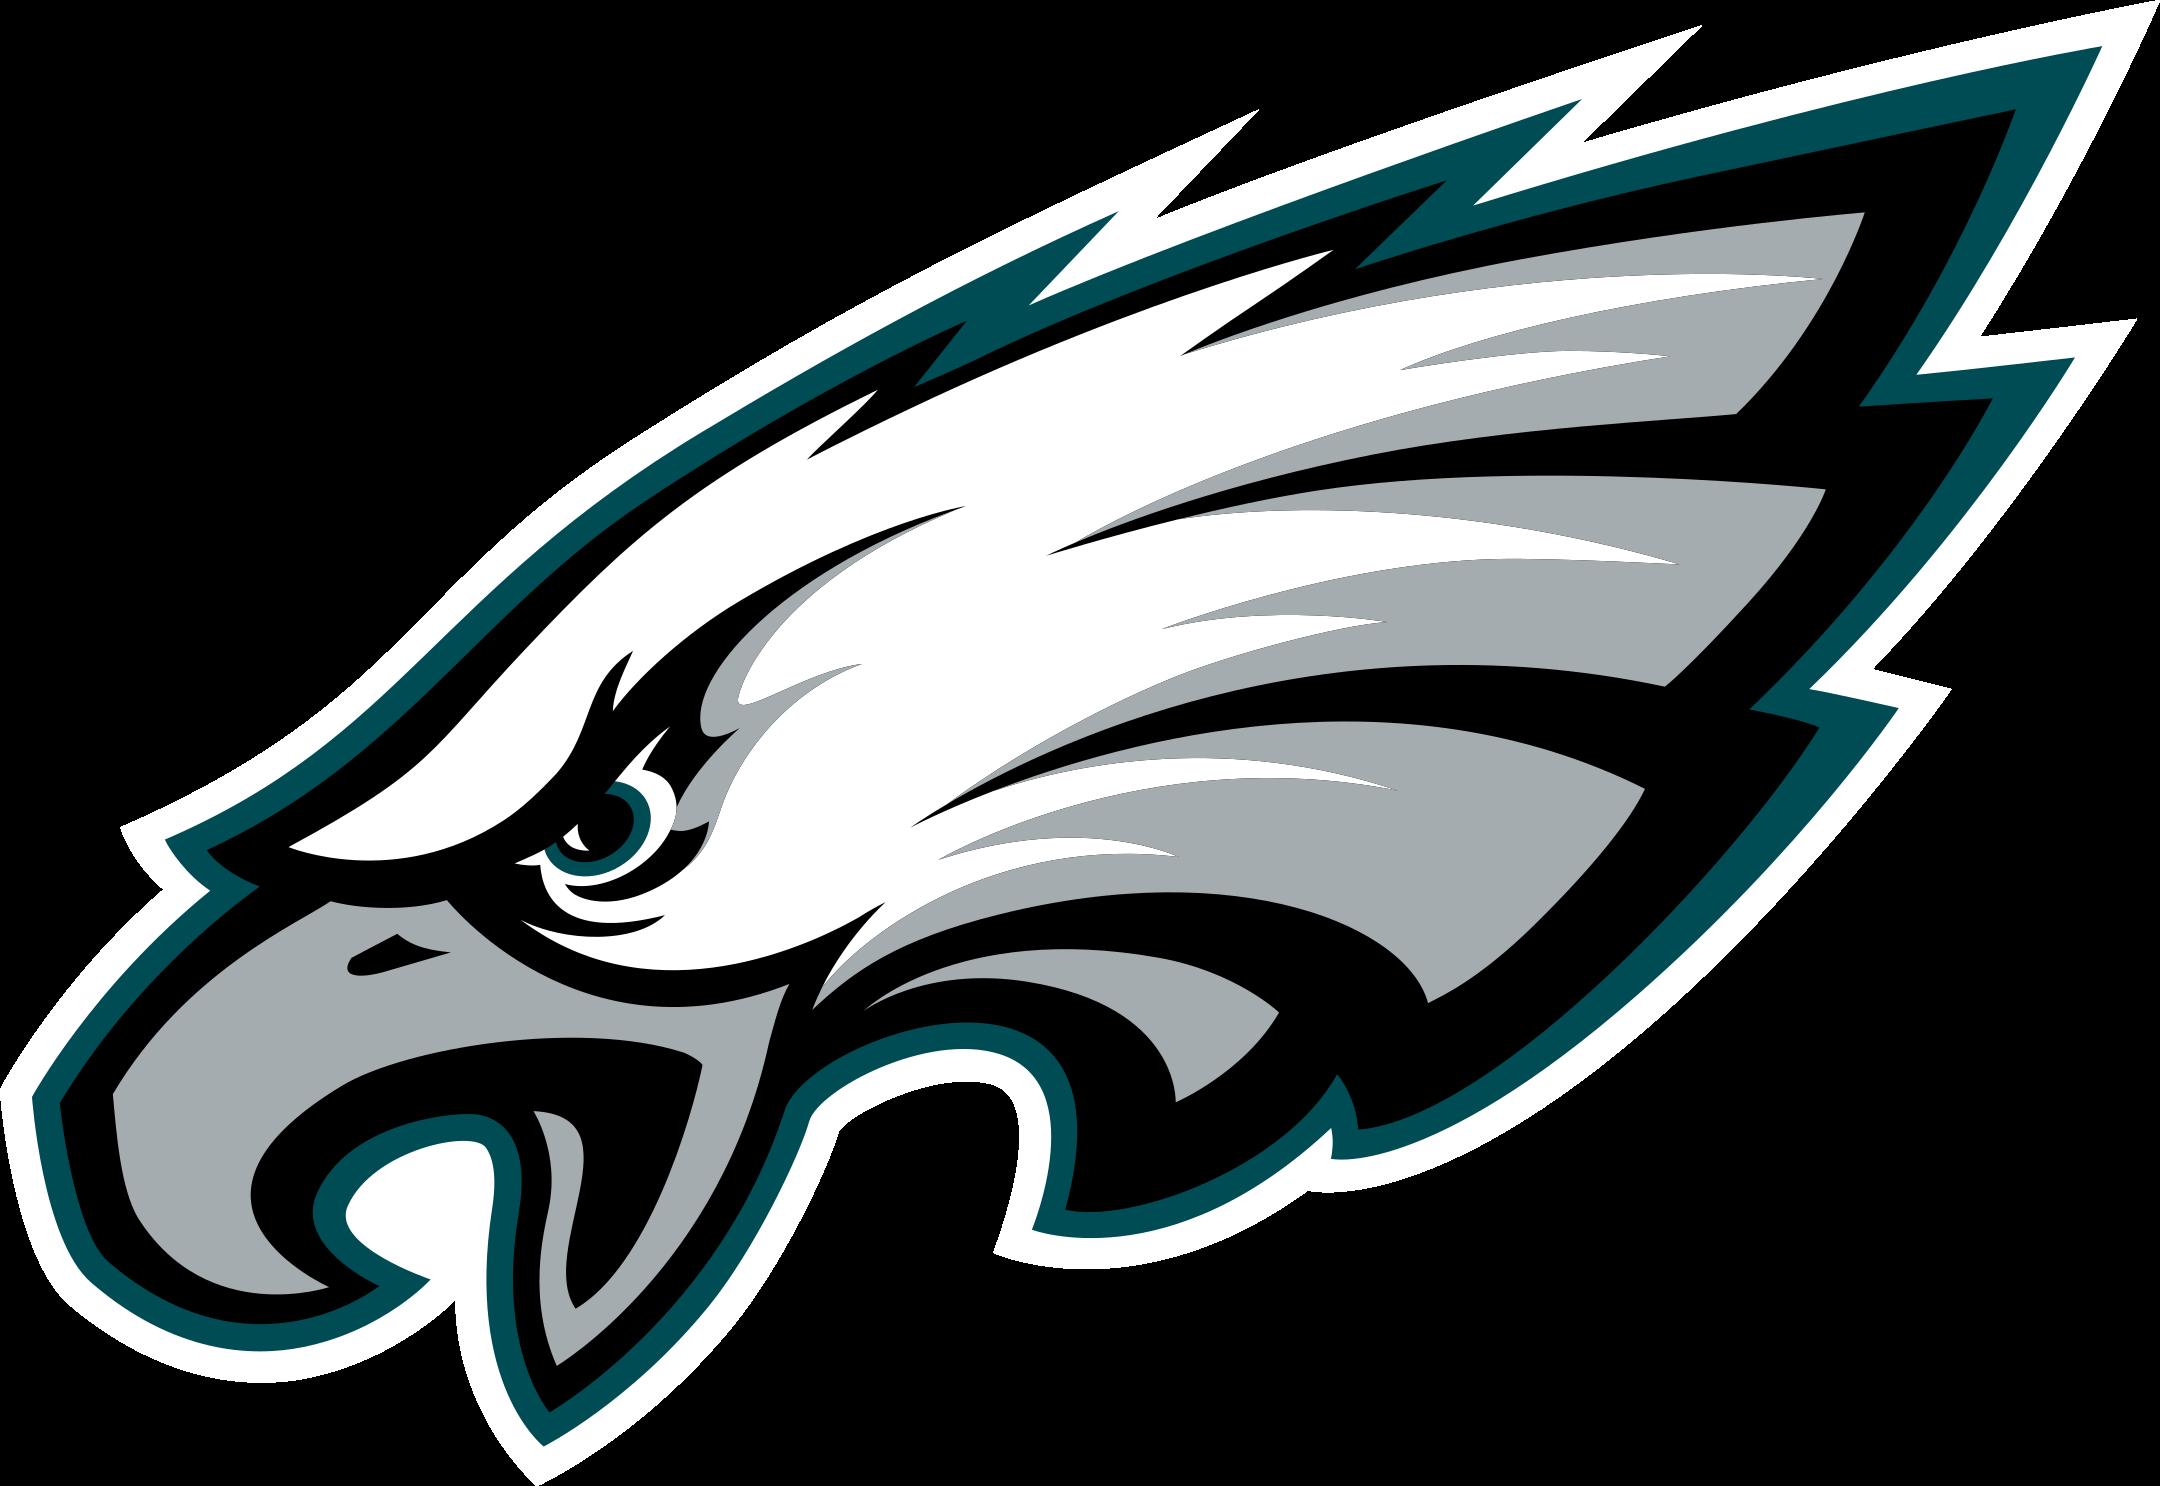 philadelphia eagles logo 1 - Philadelphia Eagles Logo